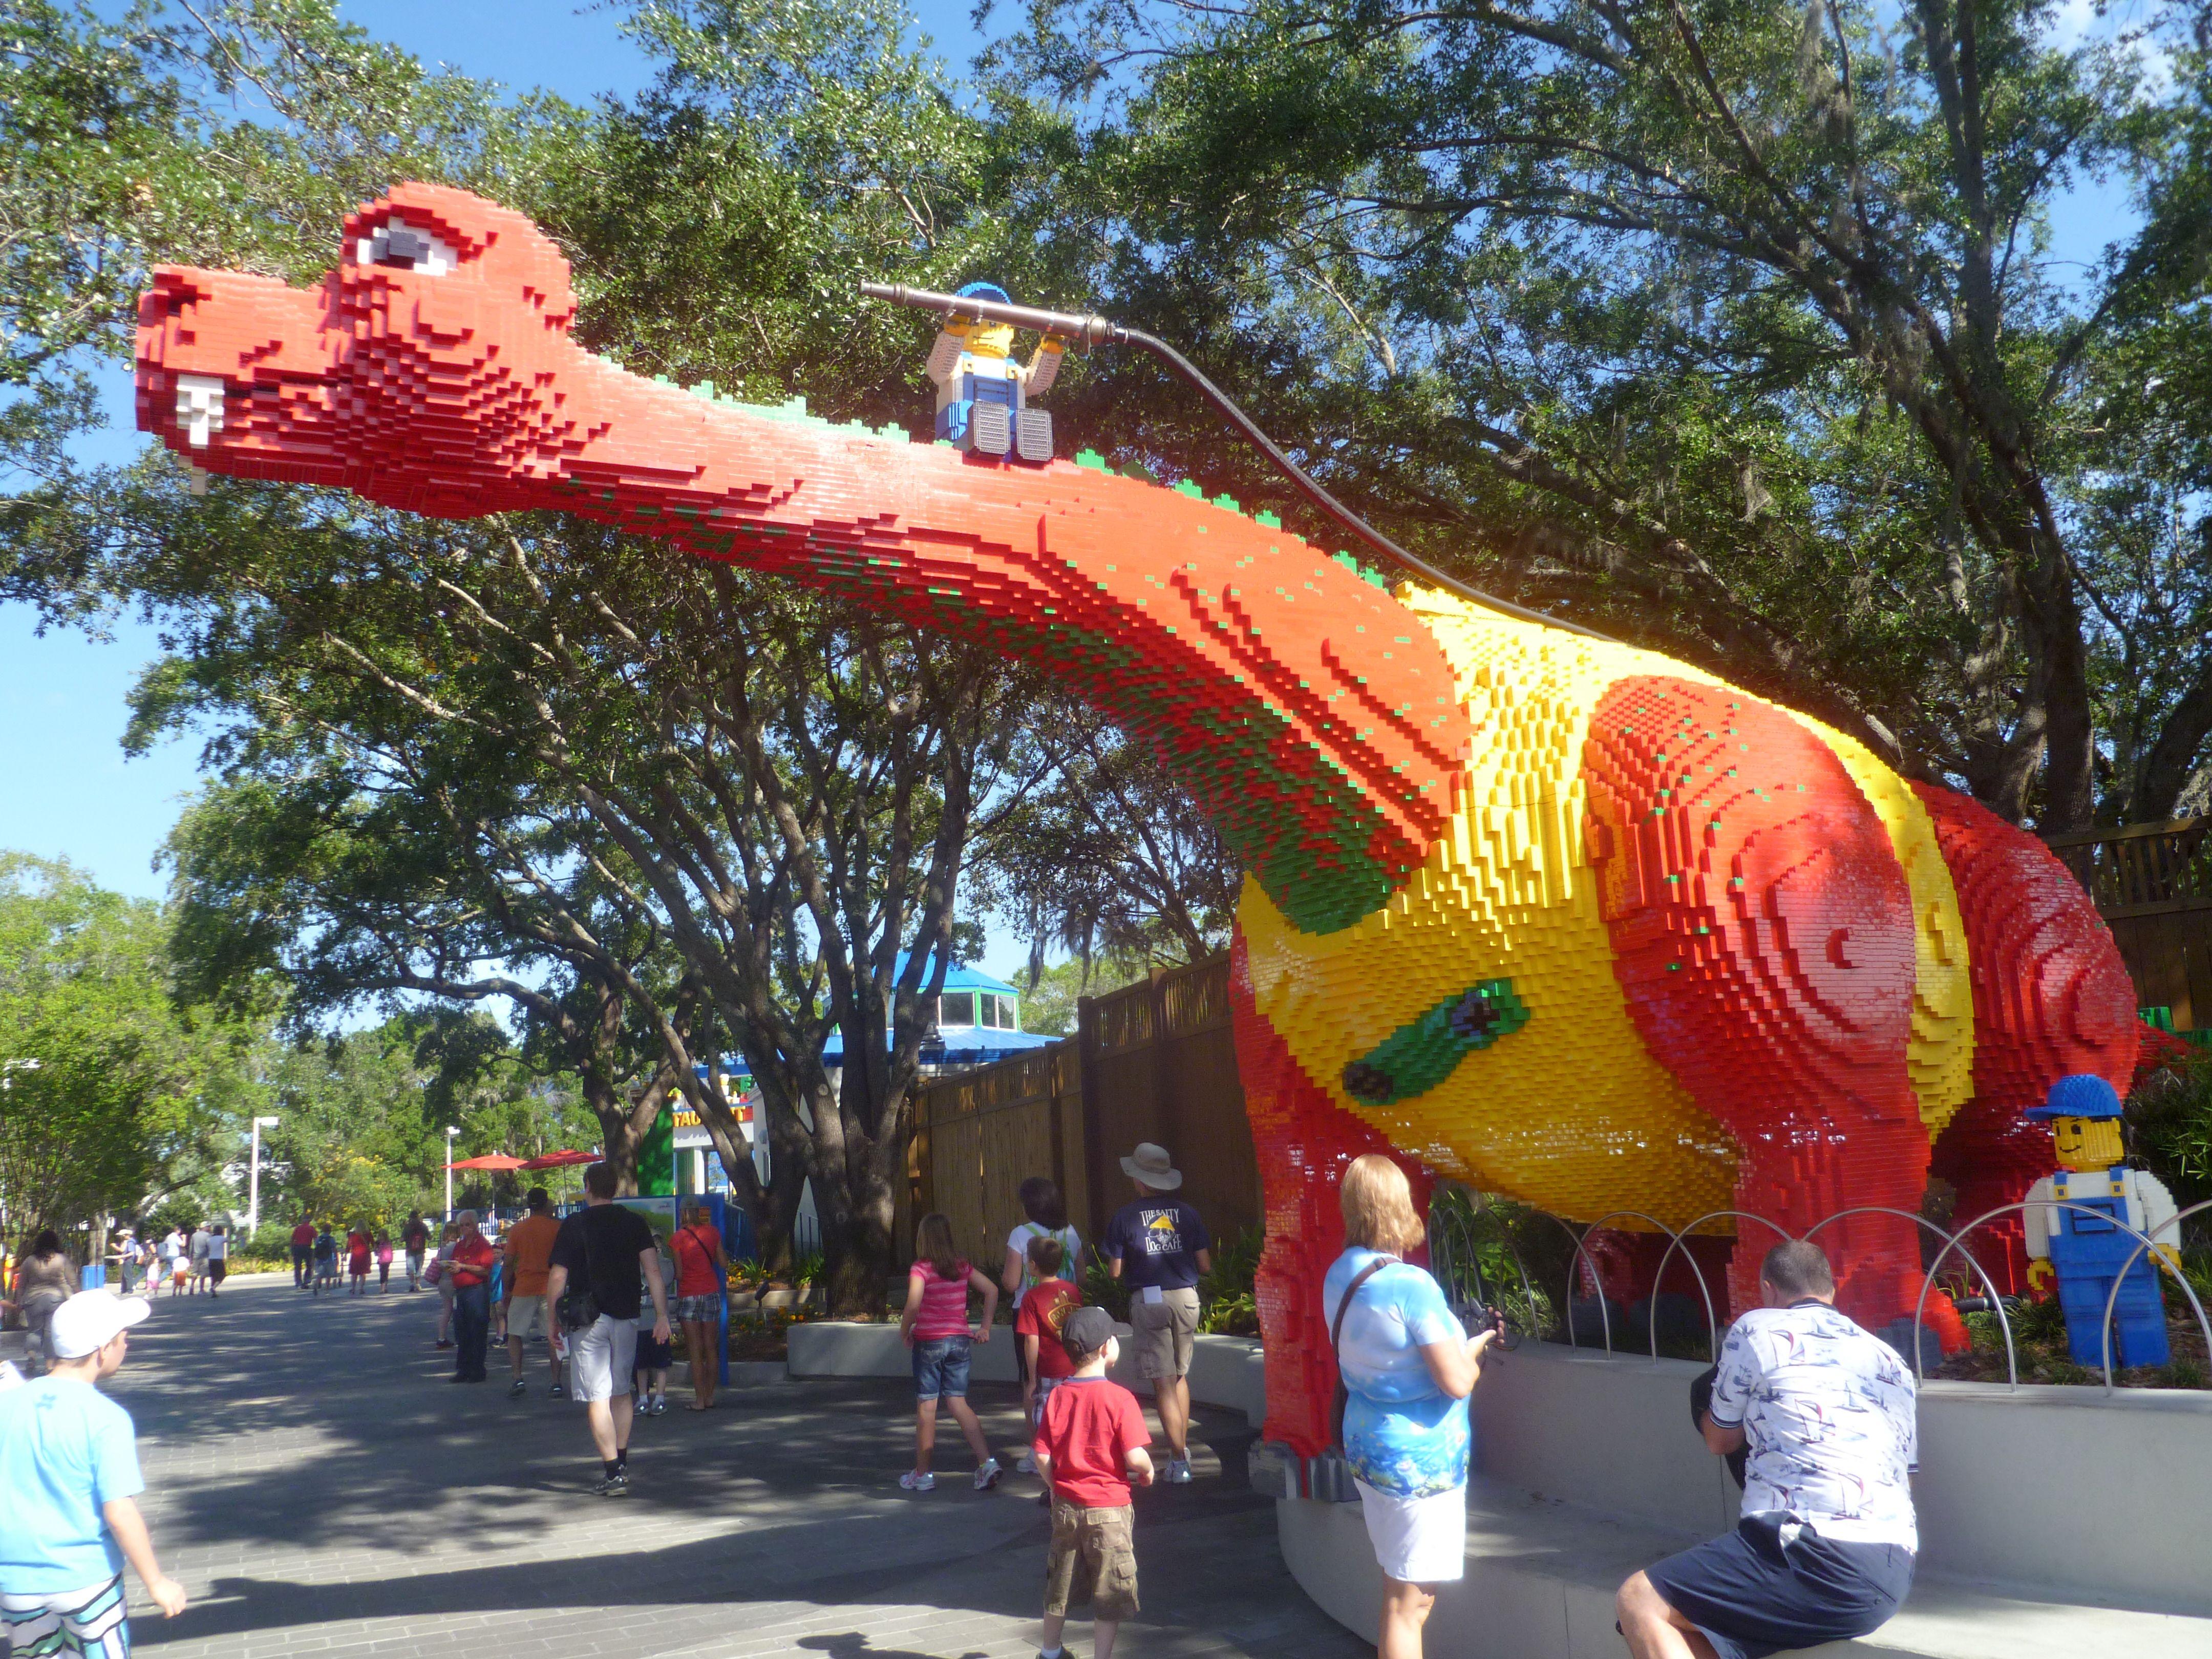 Florida Fun Shuttle, personalized service to Legoland Florida!